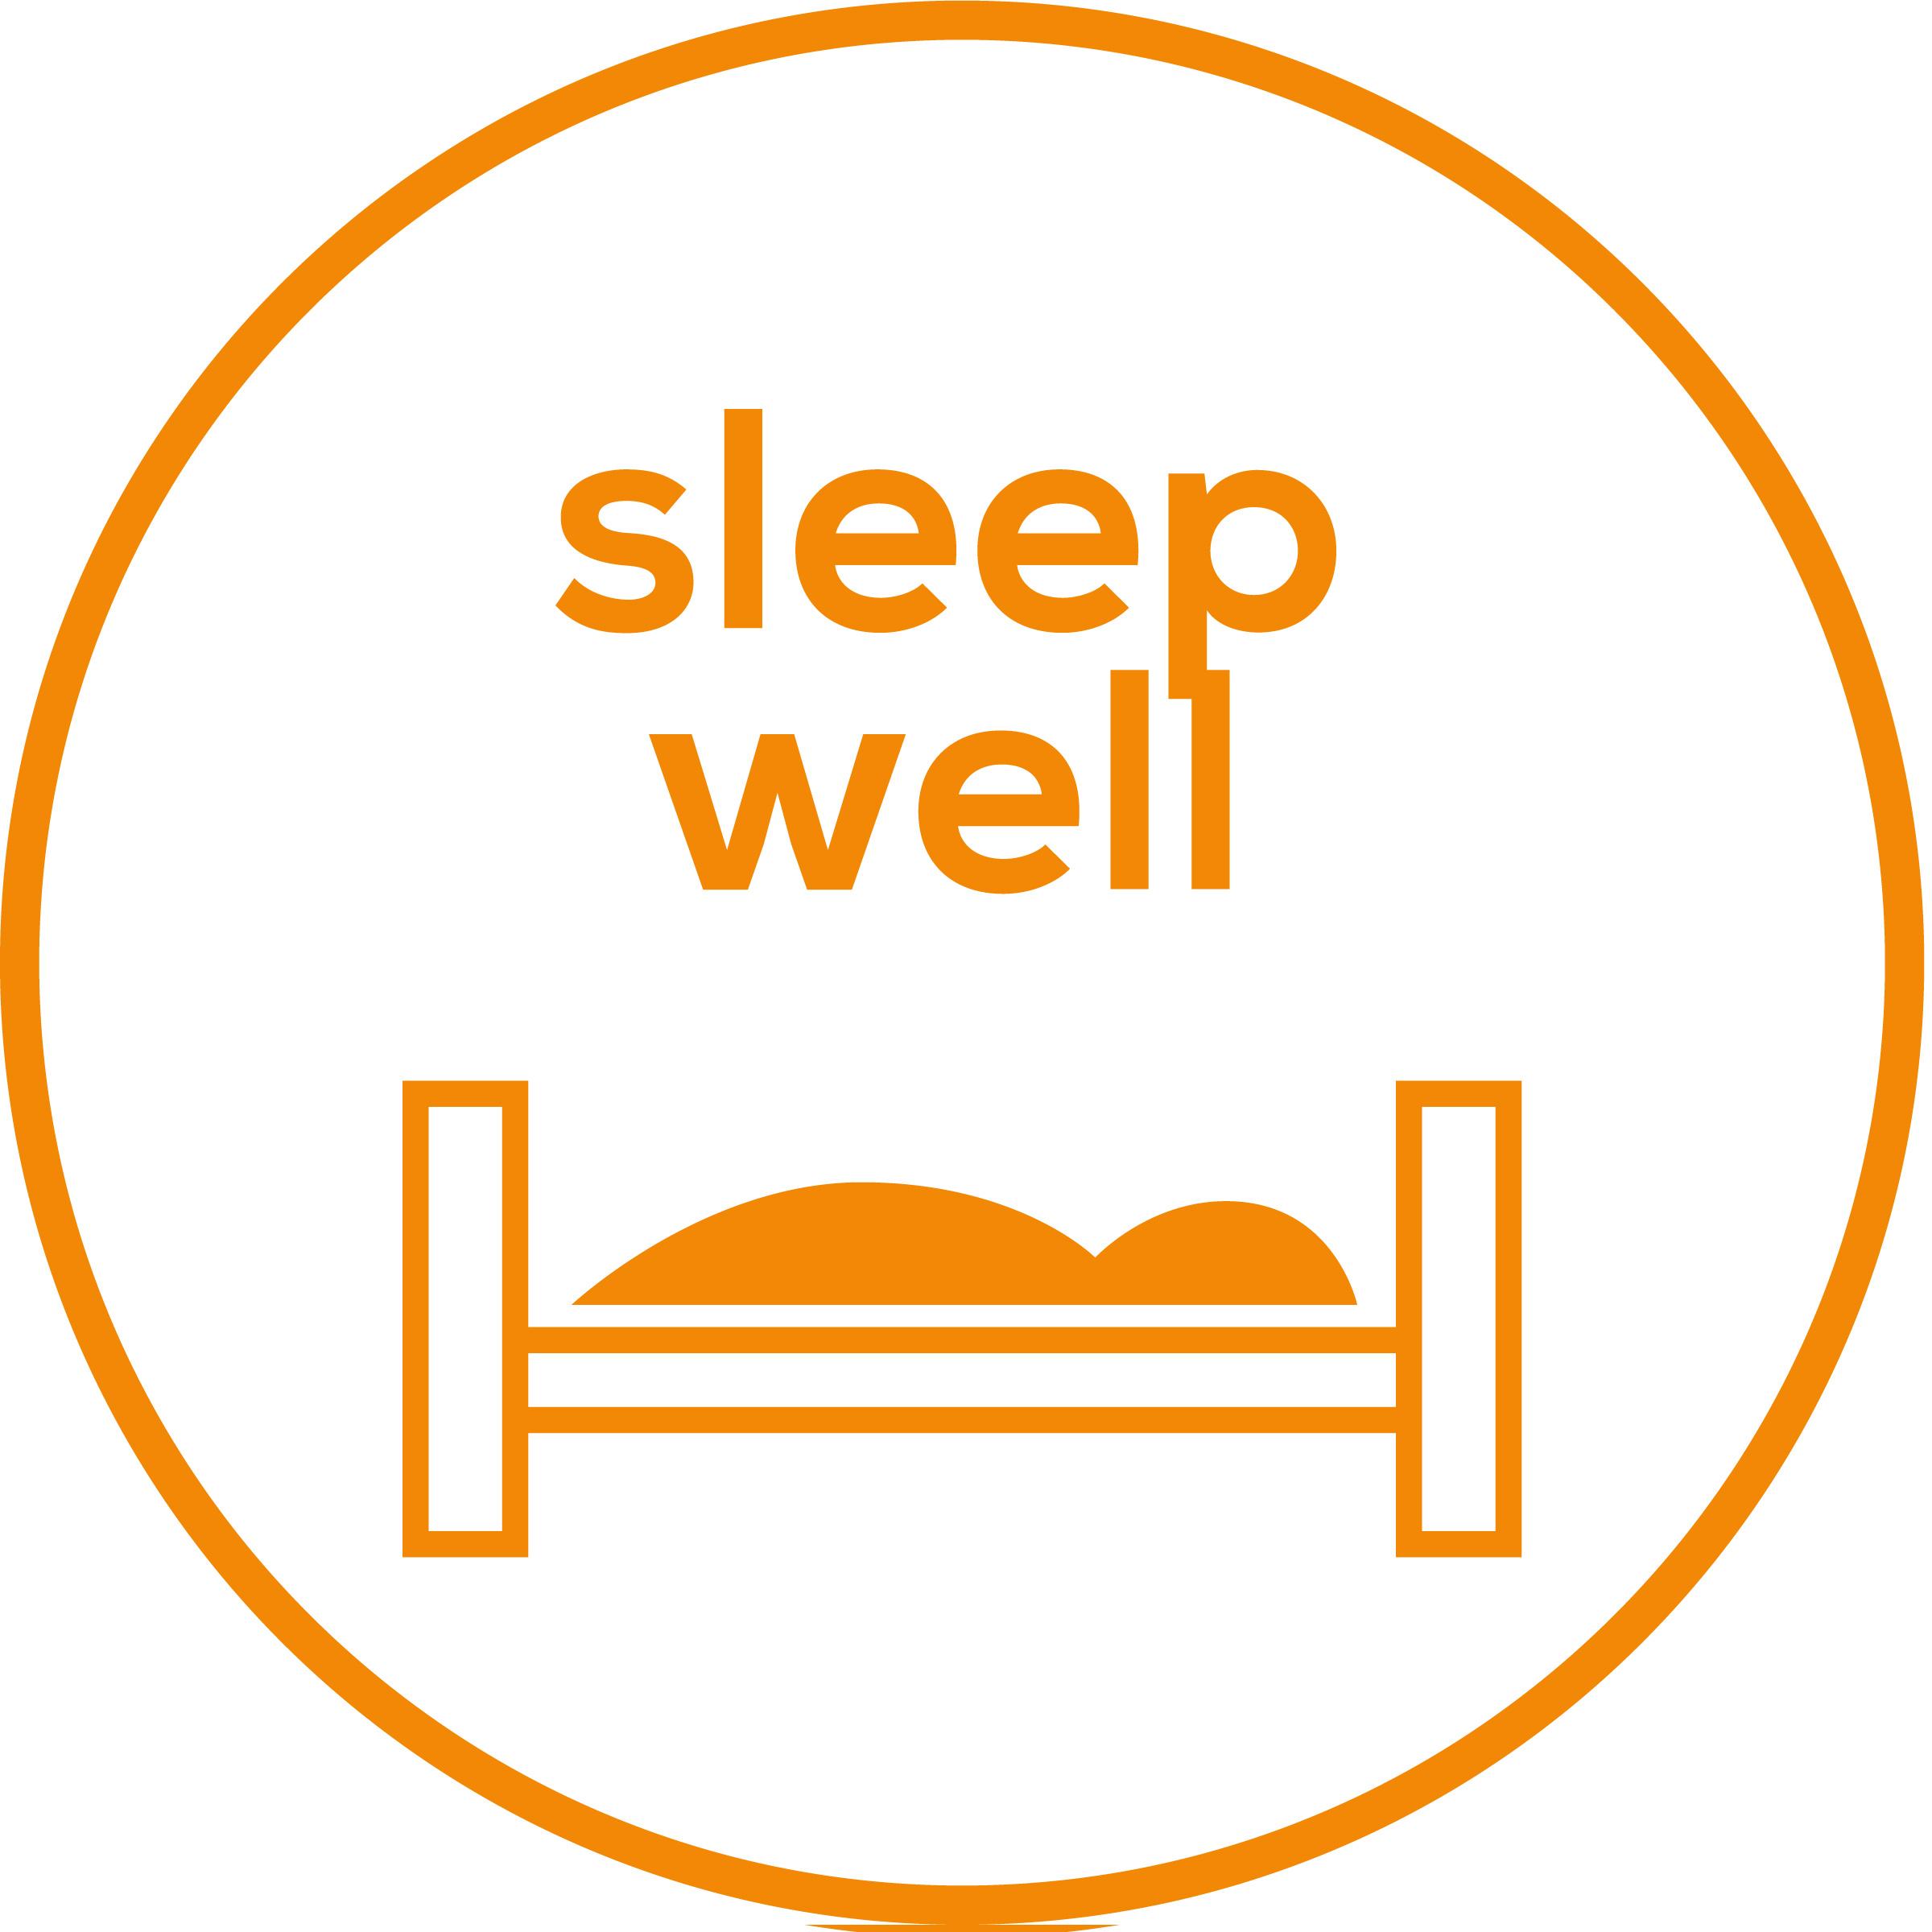 Bien dormir Pour encourager la respiration consciente